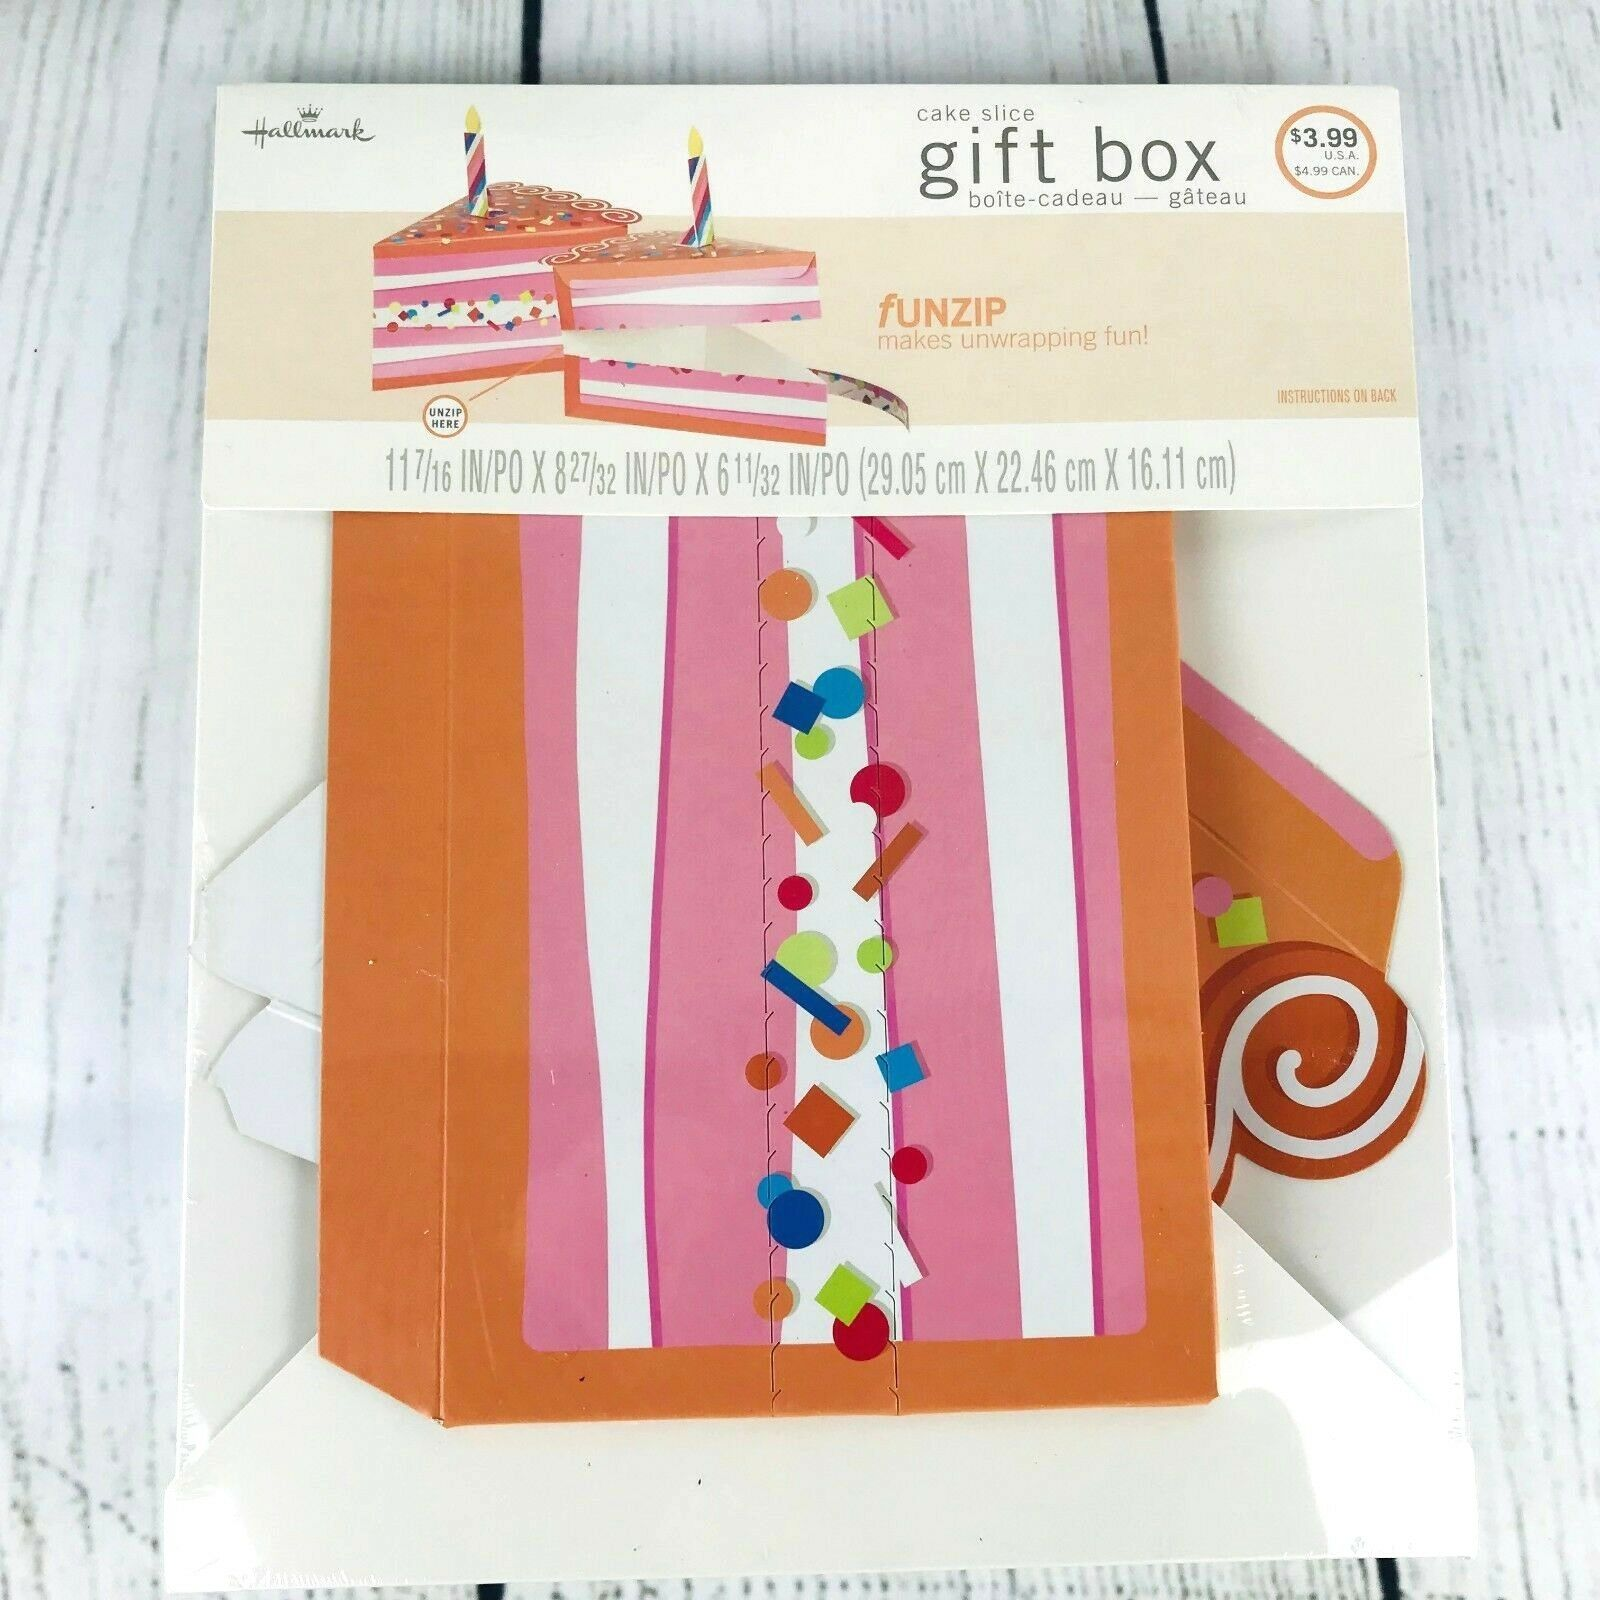 Hallmark Cake Slice Gift Box w/ Candle Birthday Present Pack